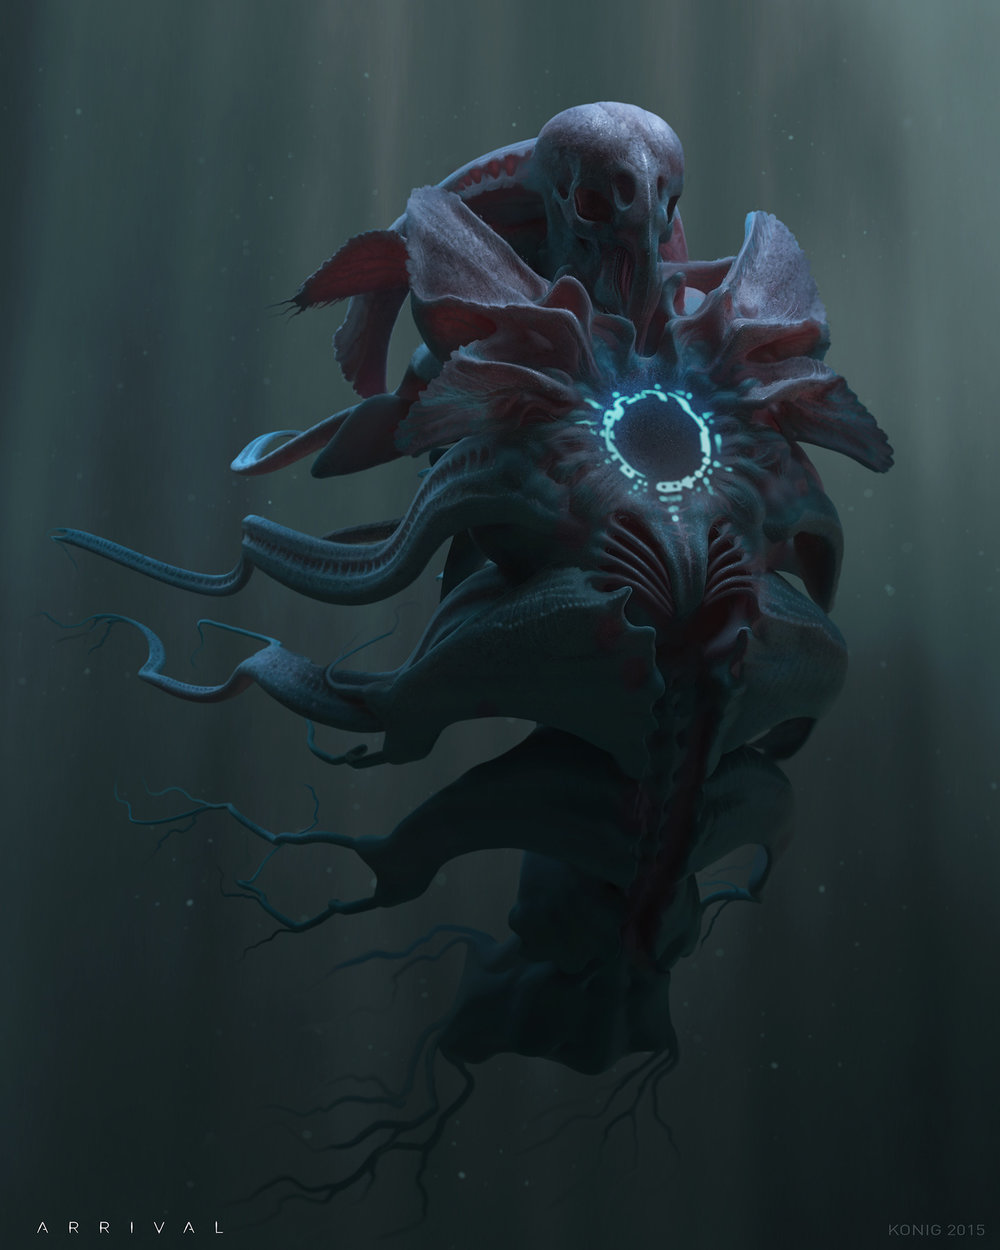 Alien Movie: Alternate Alien Concept Designs For The Fantastic Sci-Fi